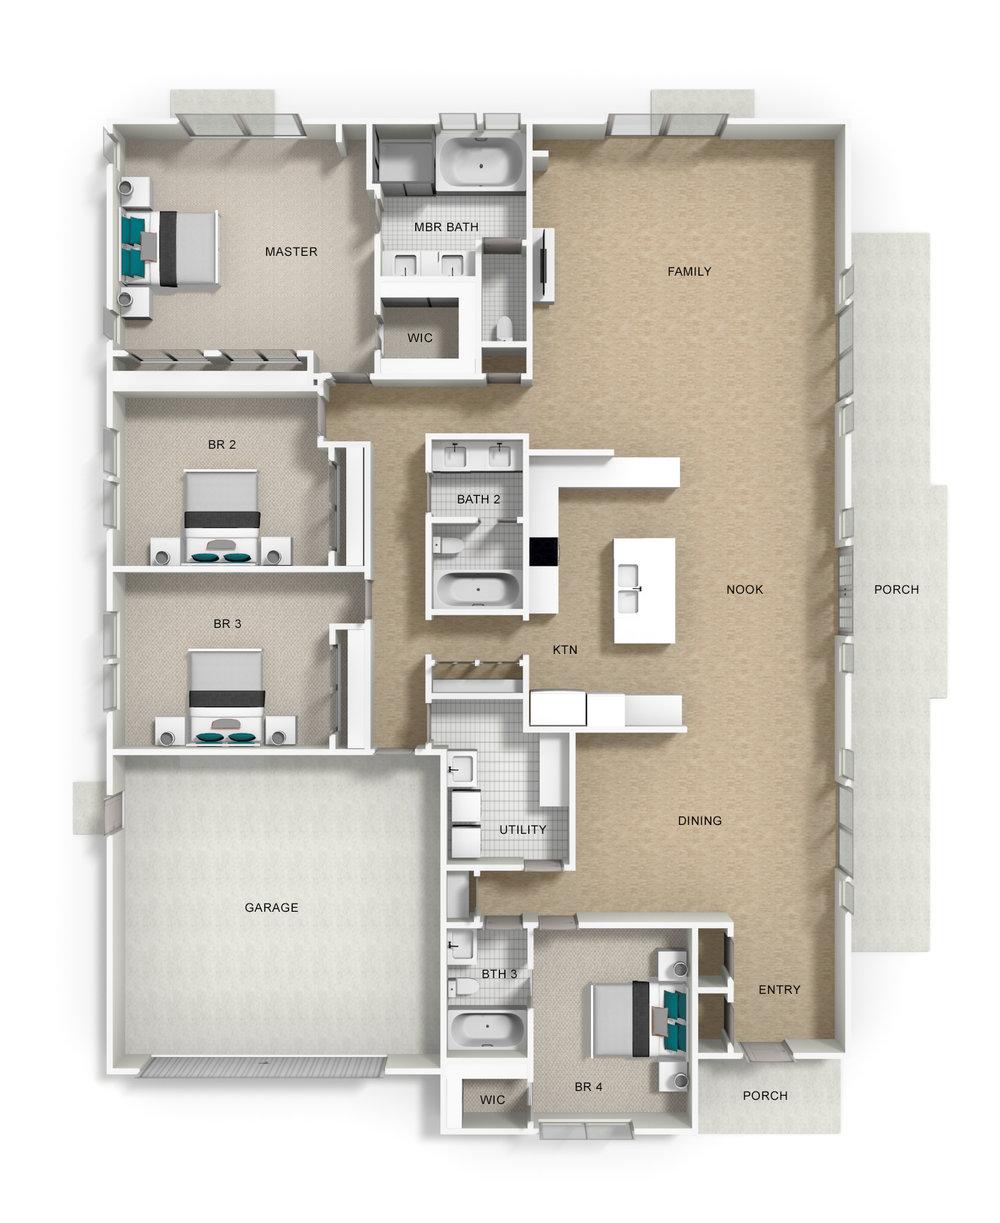 1028_3D Floorplan (JPG).jpg